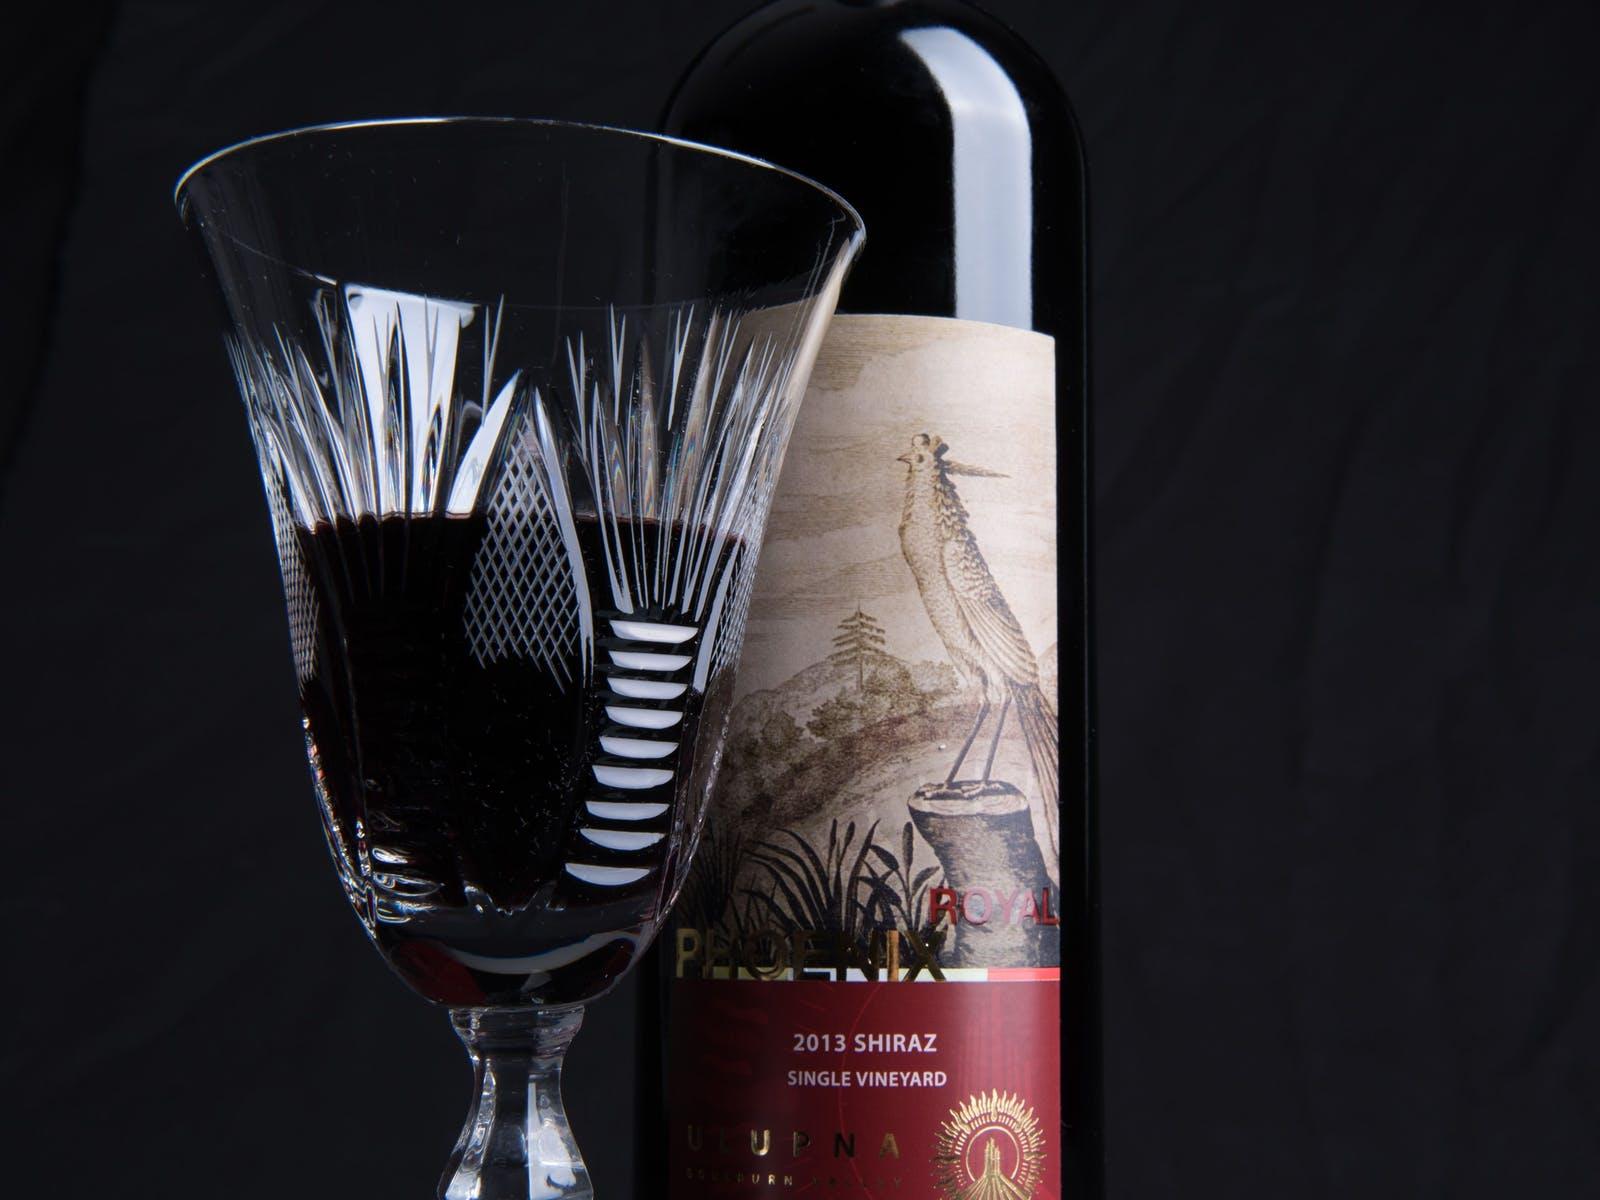 Ulupna Winery